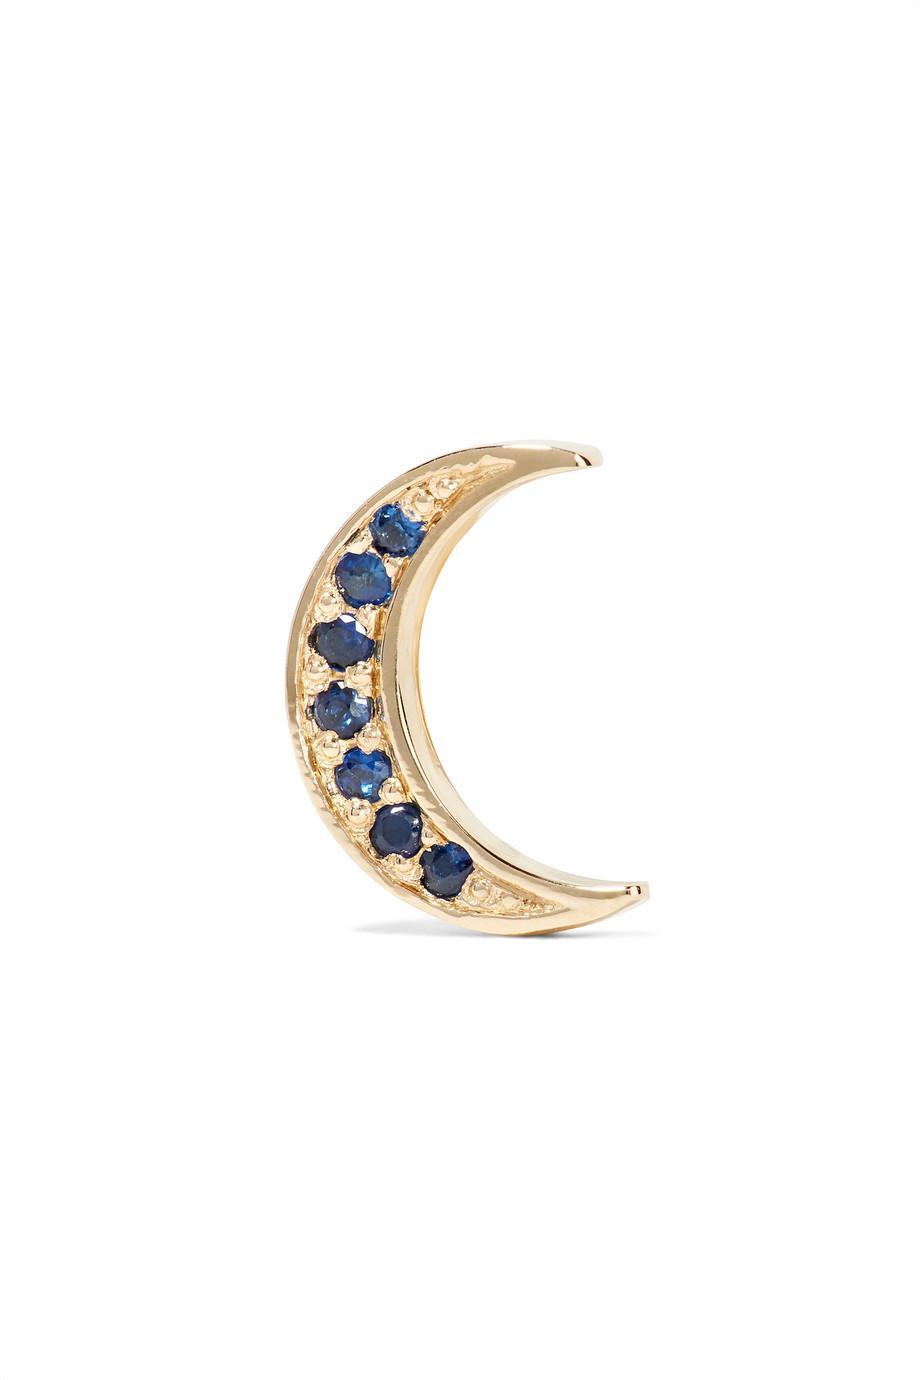 Andrea Fohrman Mini Crescent 14-karat Gold Sapphire Earring vYj8rive